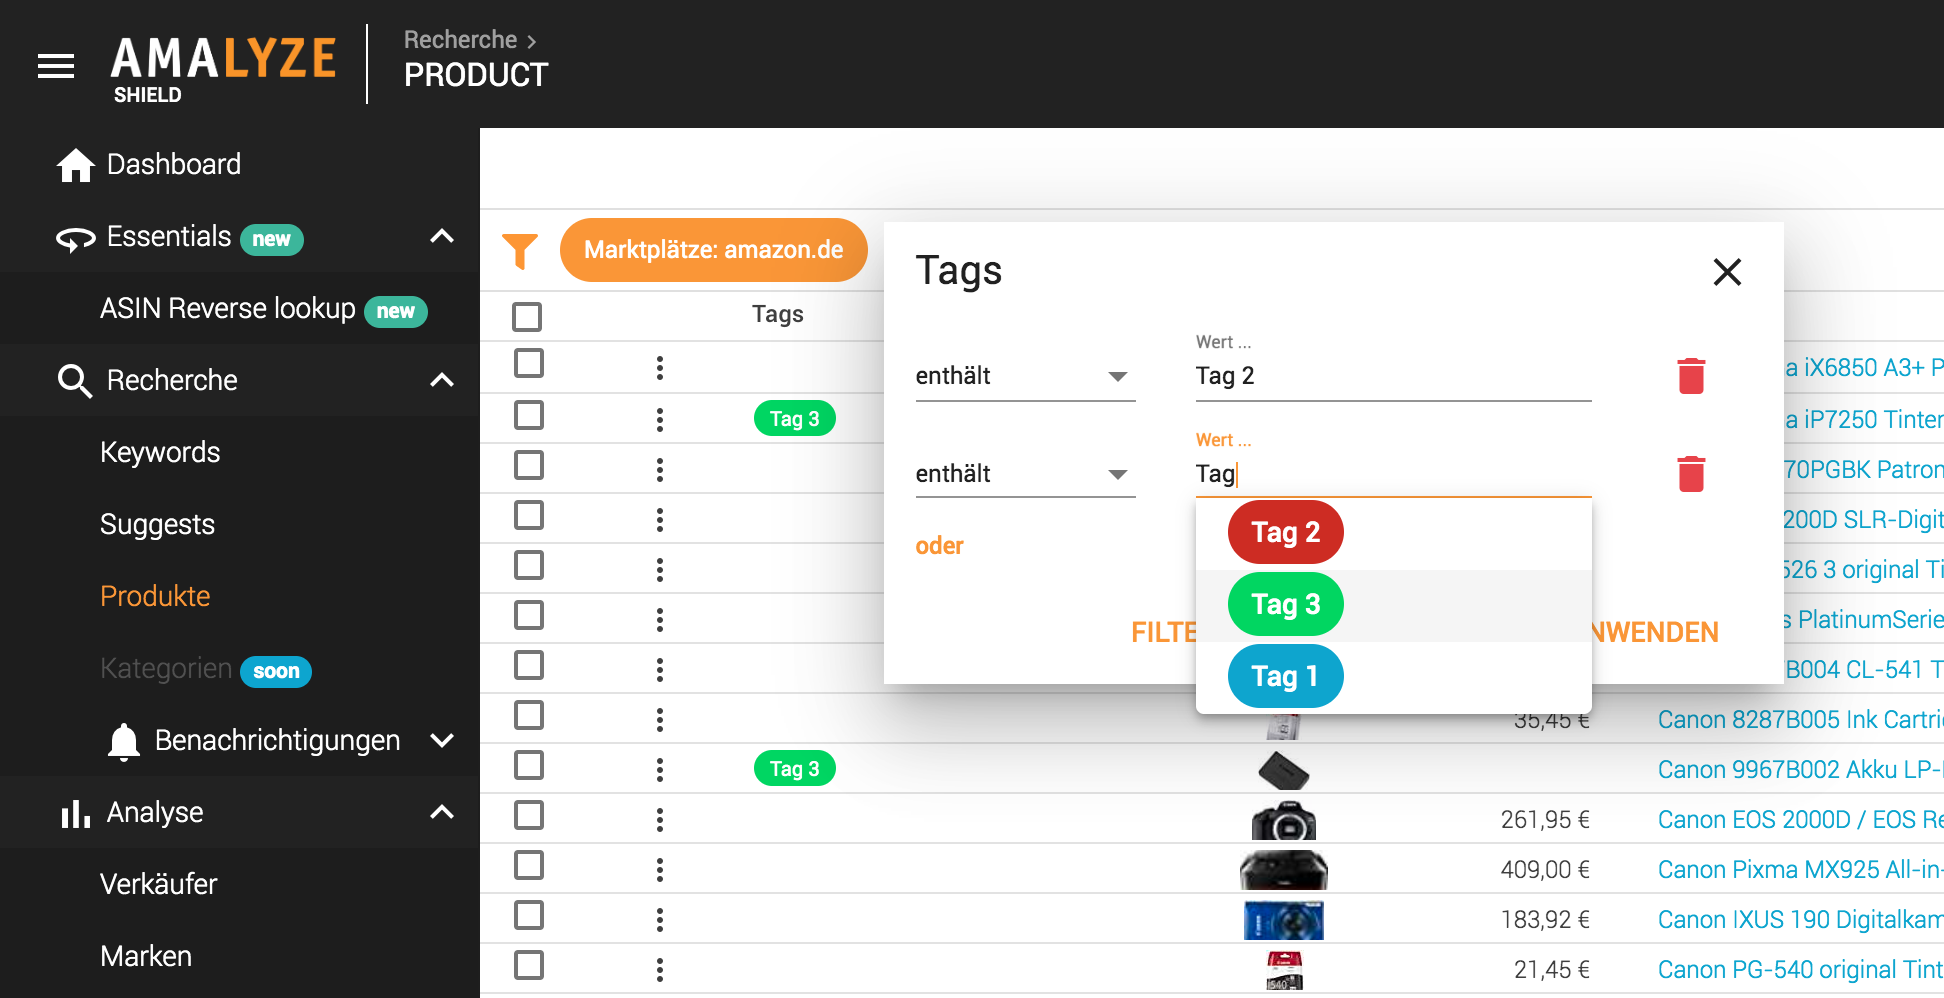 Recherche_Produkte_Tabellen Tags_Filtern nach Tags